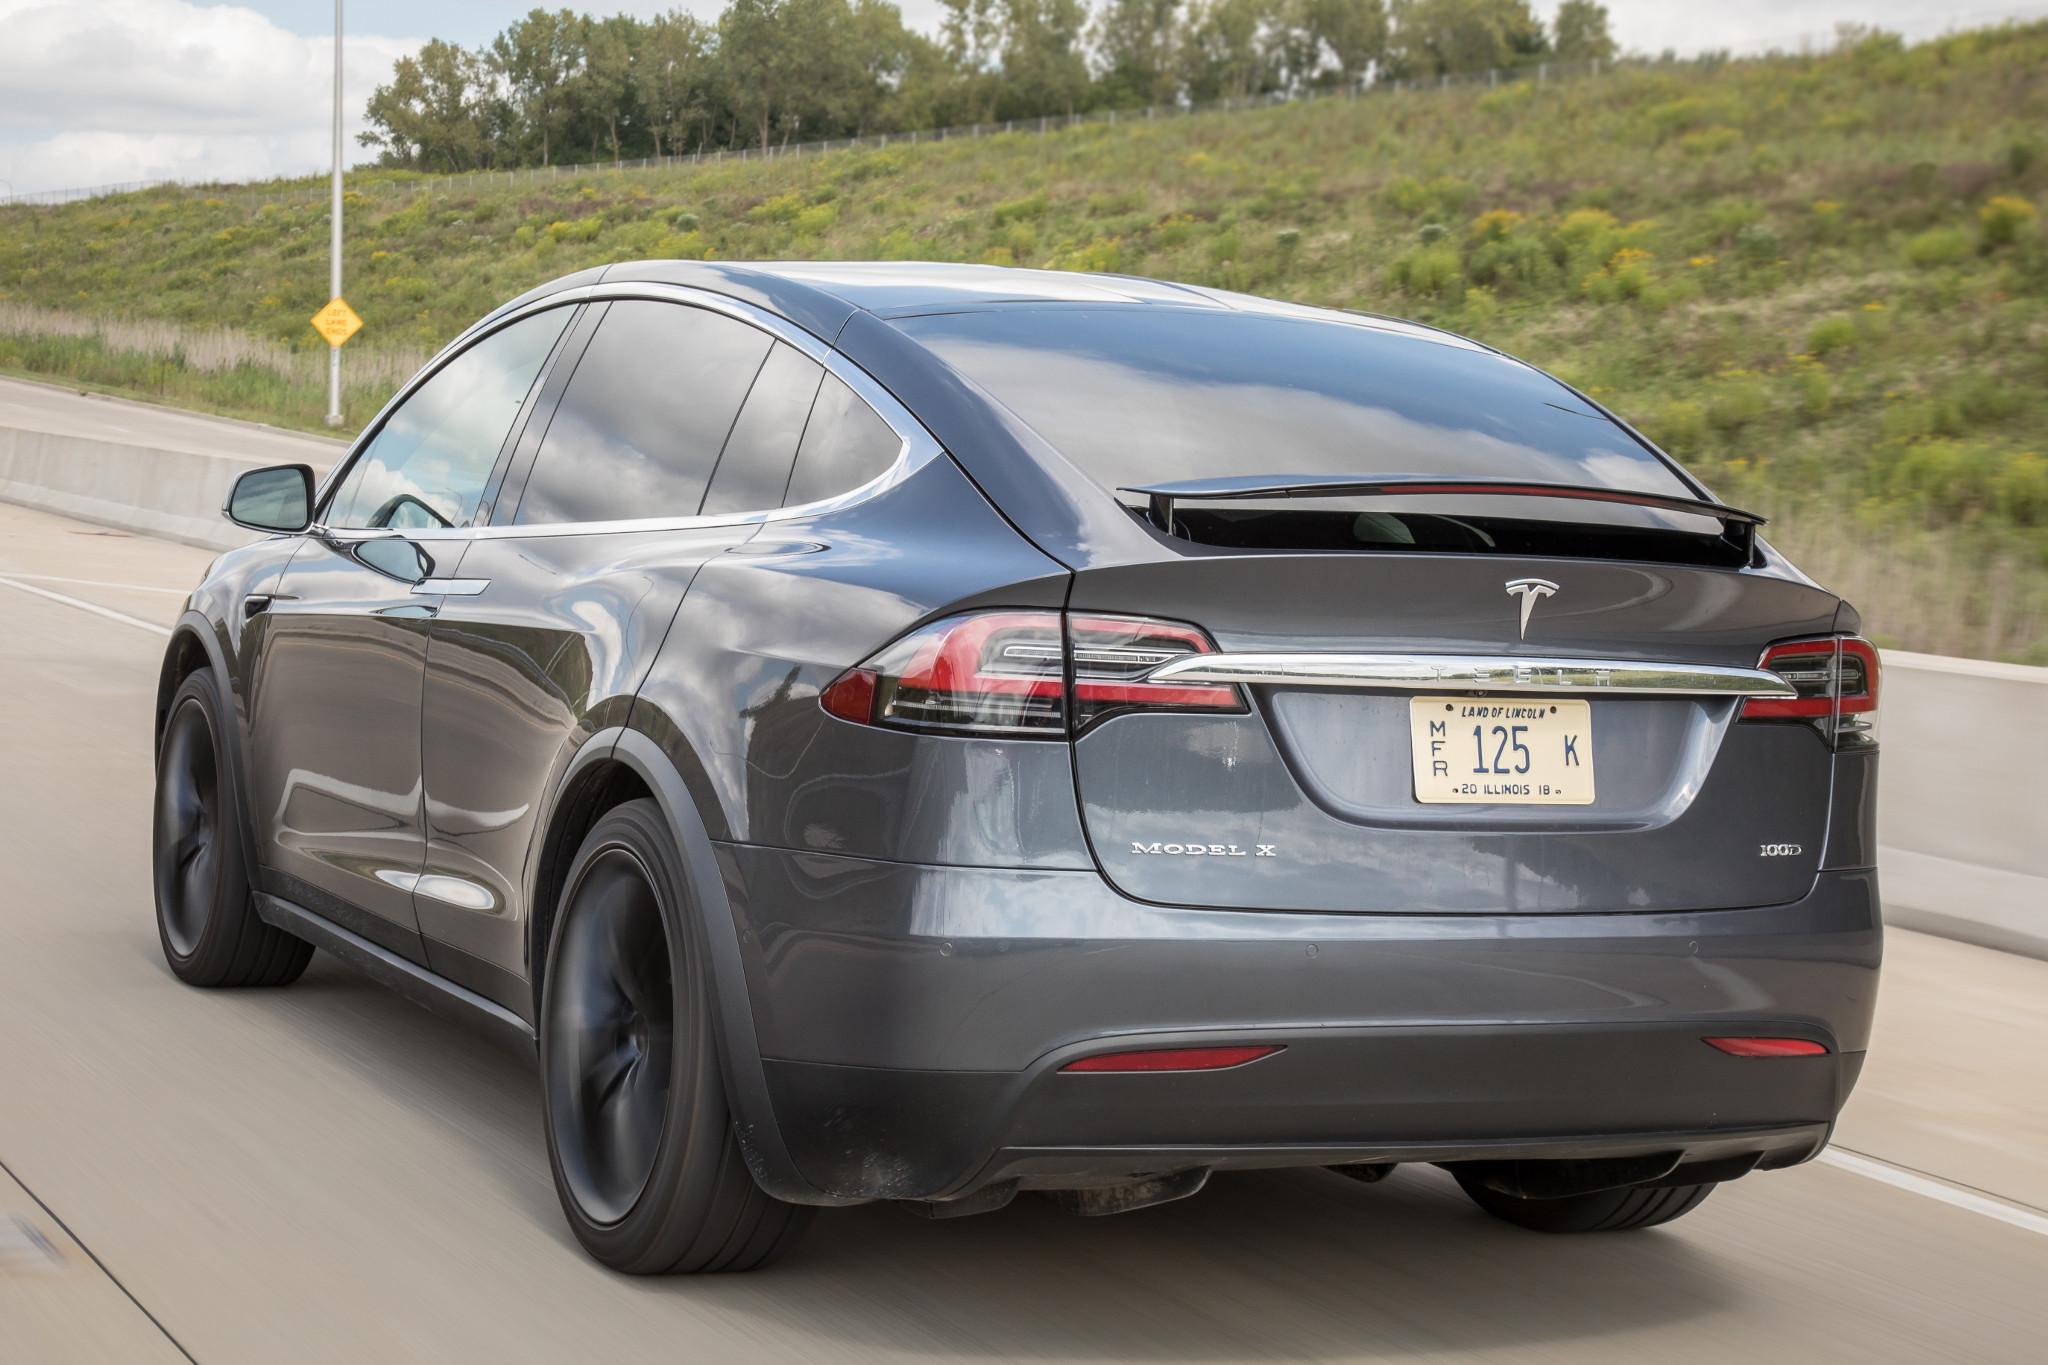 The Week in Tesla News: Rivian Gets OK for Colorado Sales, Fisker Ocean Info Flows and Tesla Takes Iowa State Fair(?)